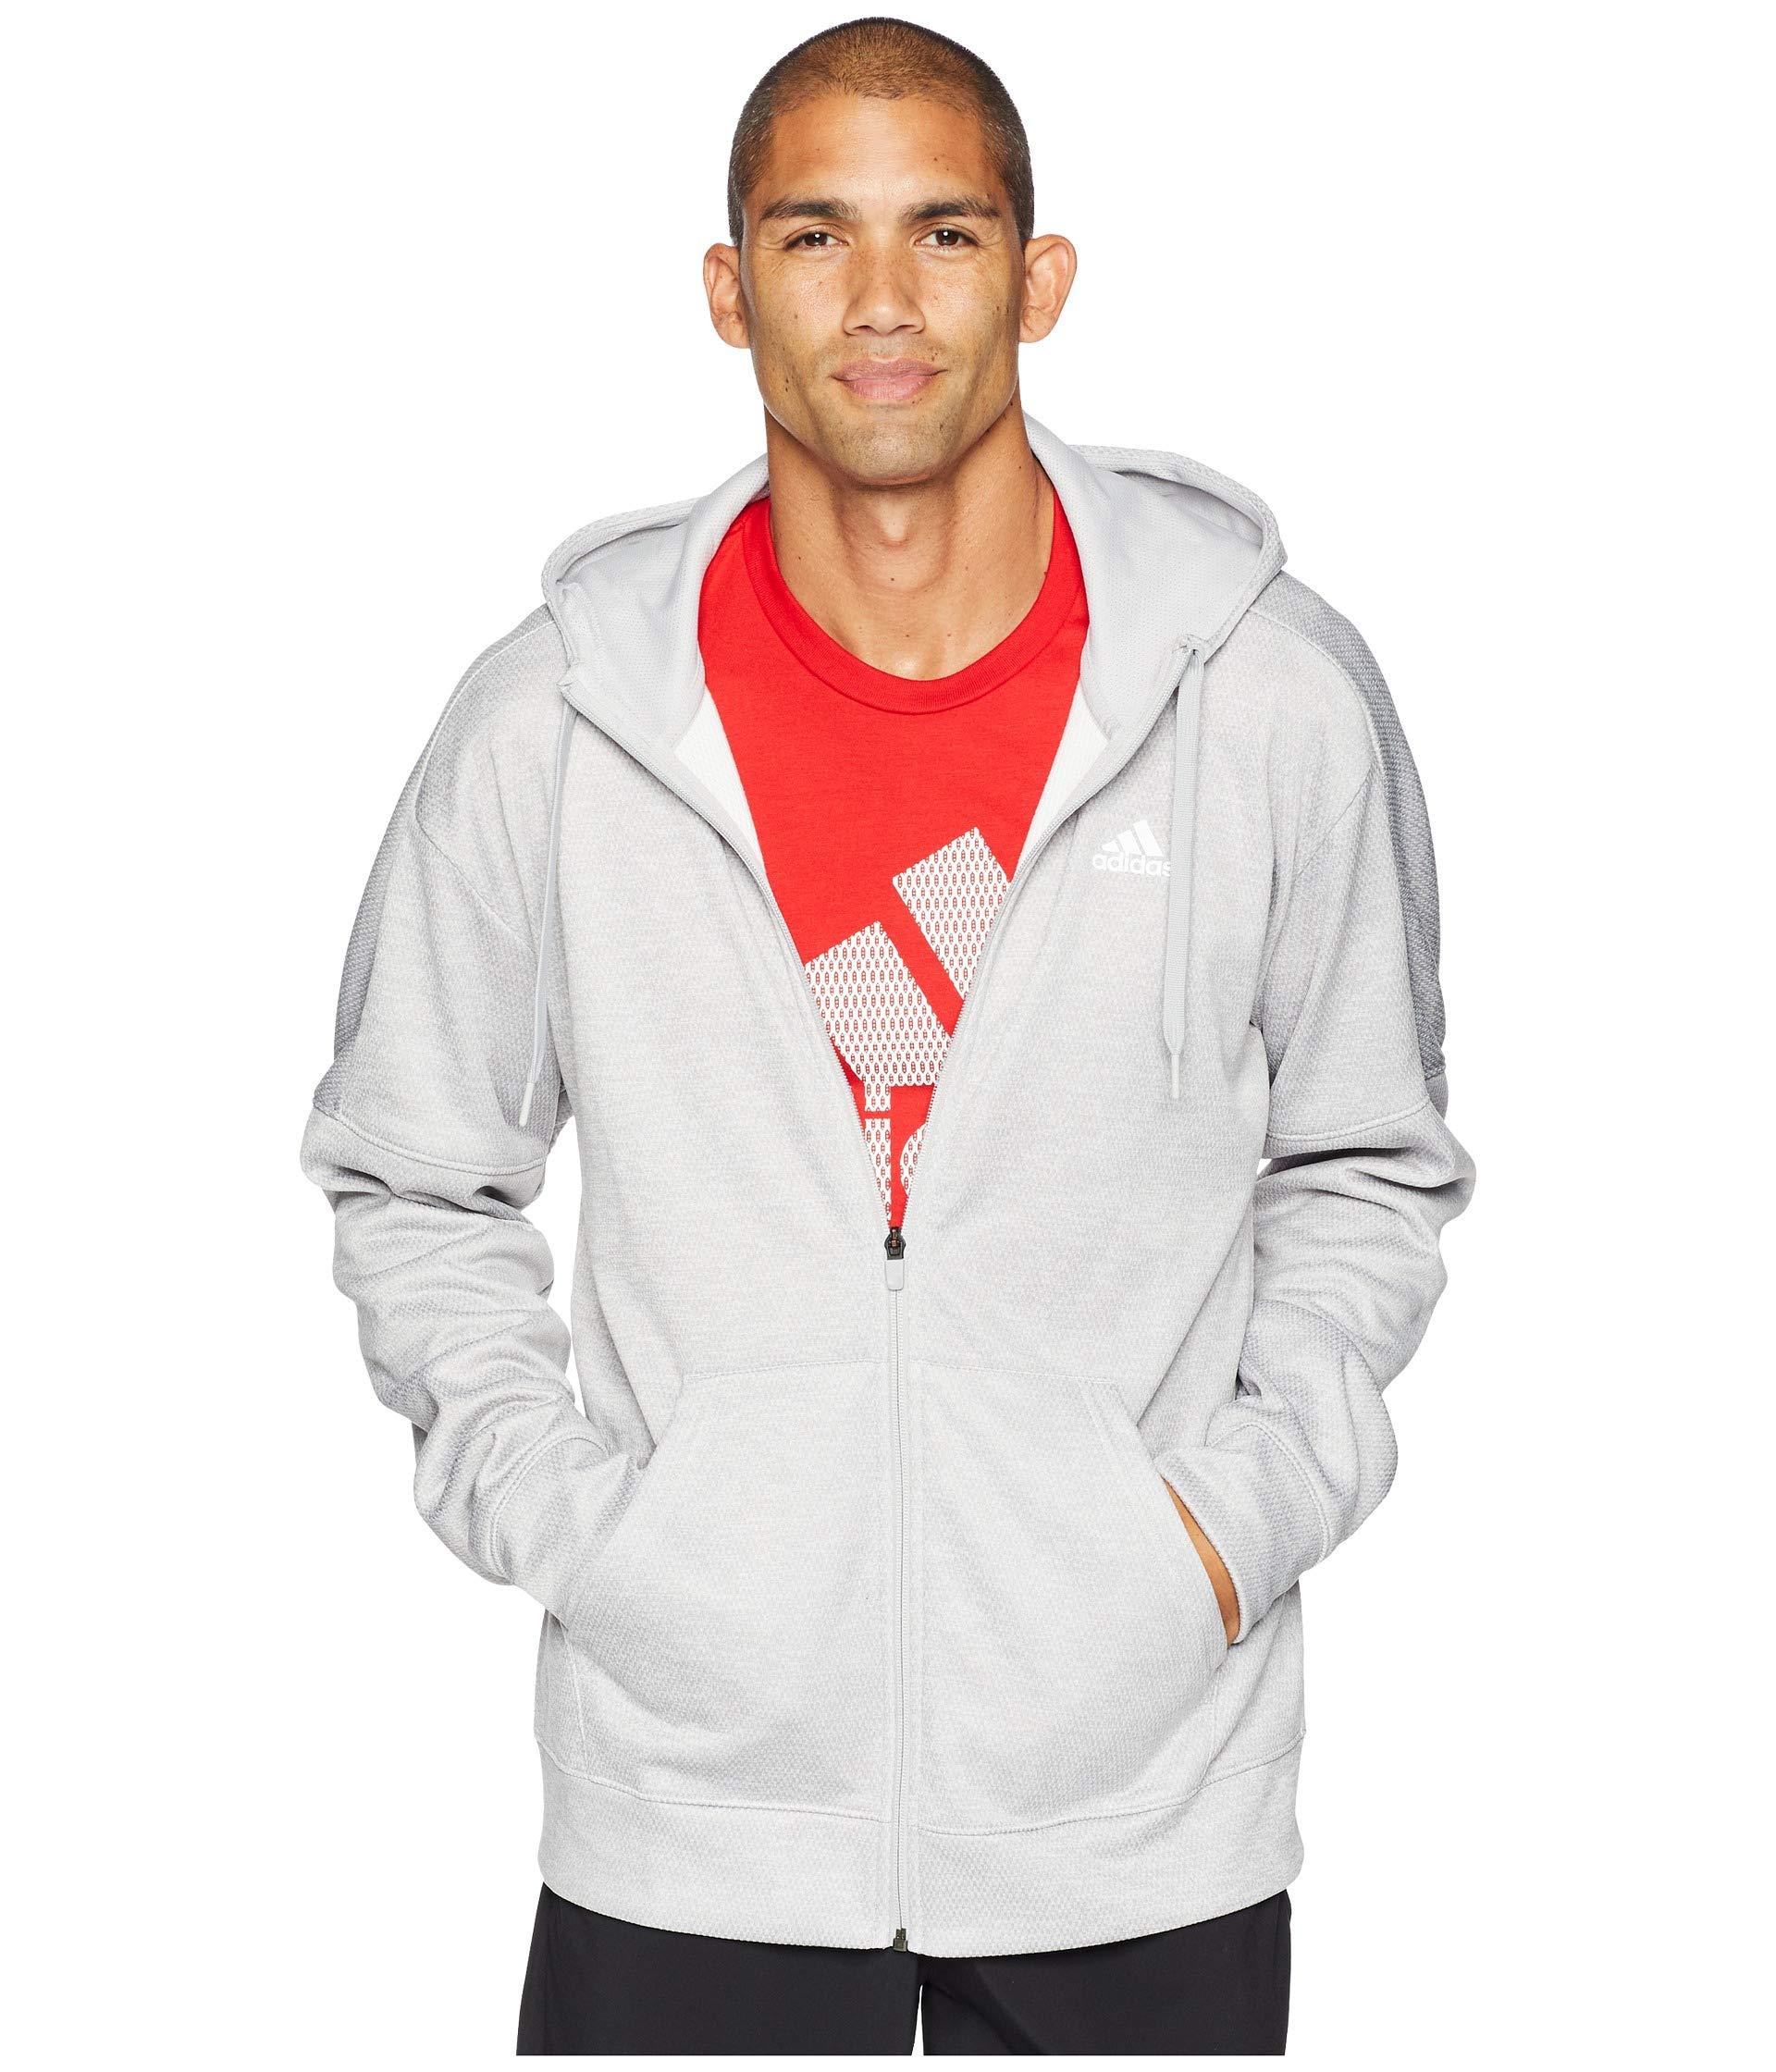 Hoodie Issue Two Team Fleece Grey Adidas Full Metallic Zip qX5wnp4z